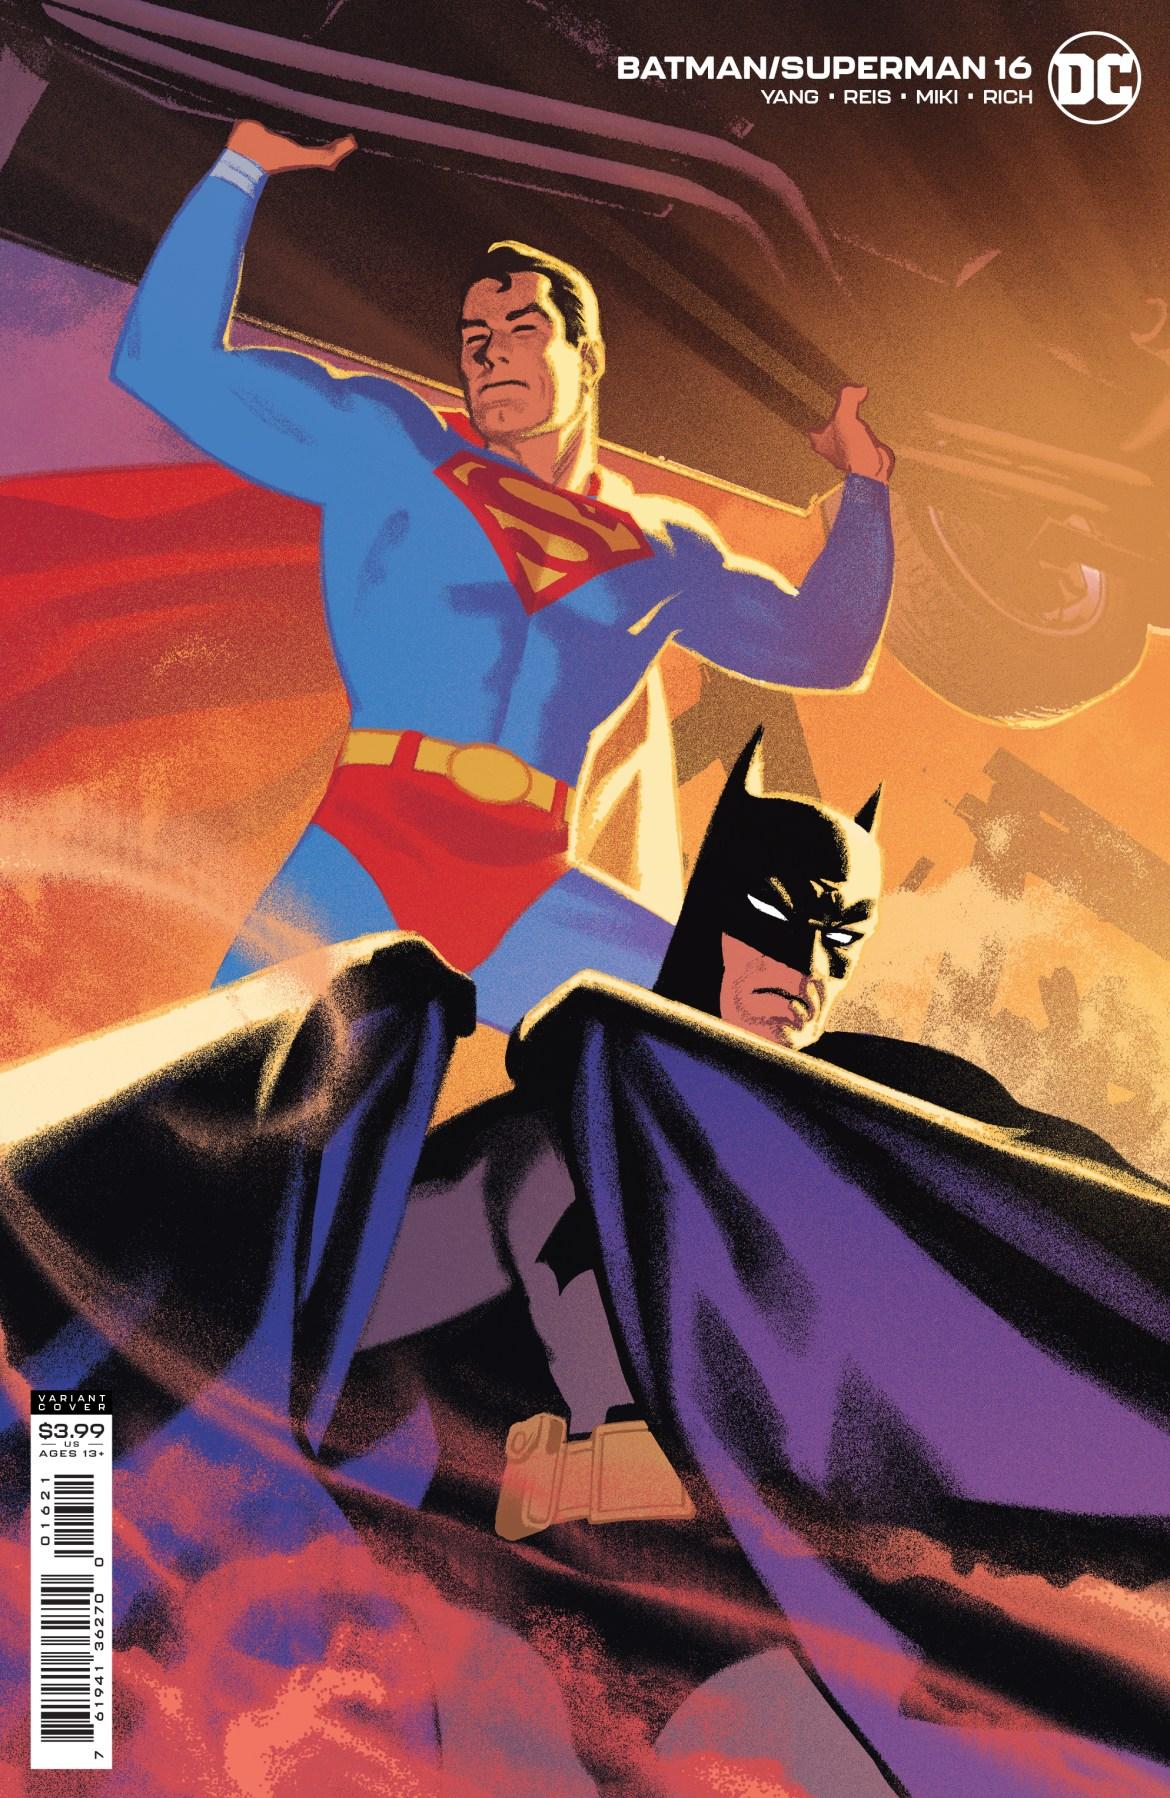 0121DC033 ComicList: DC Comics New Releases for 03/24/2021